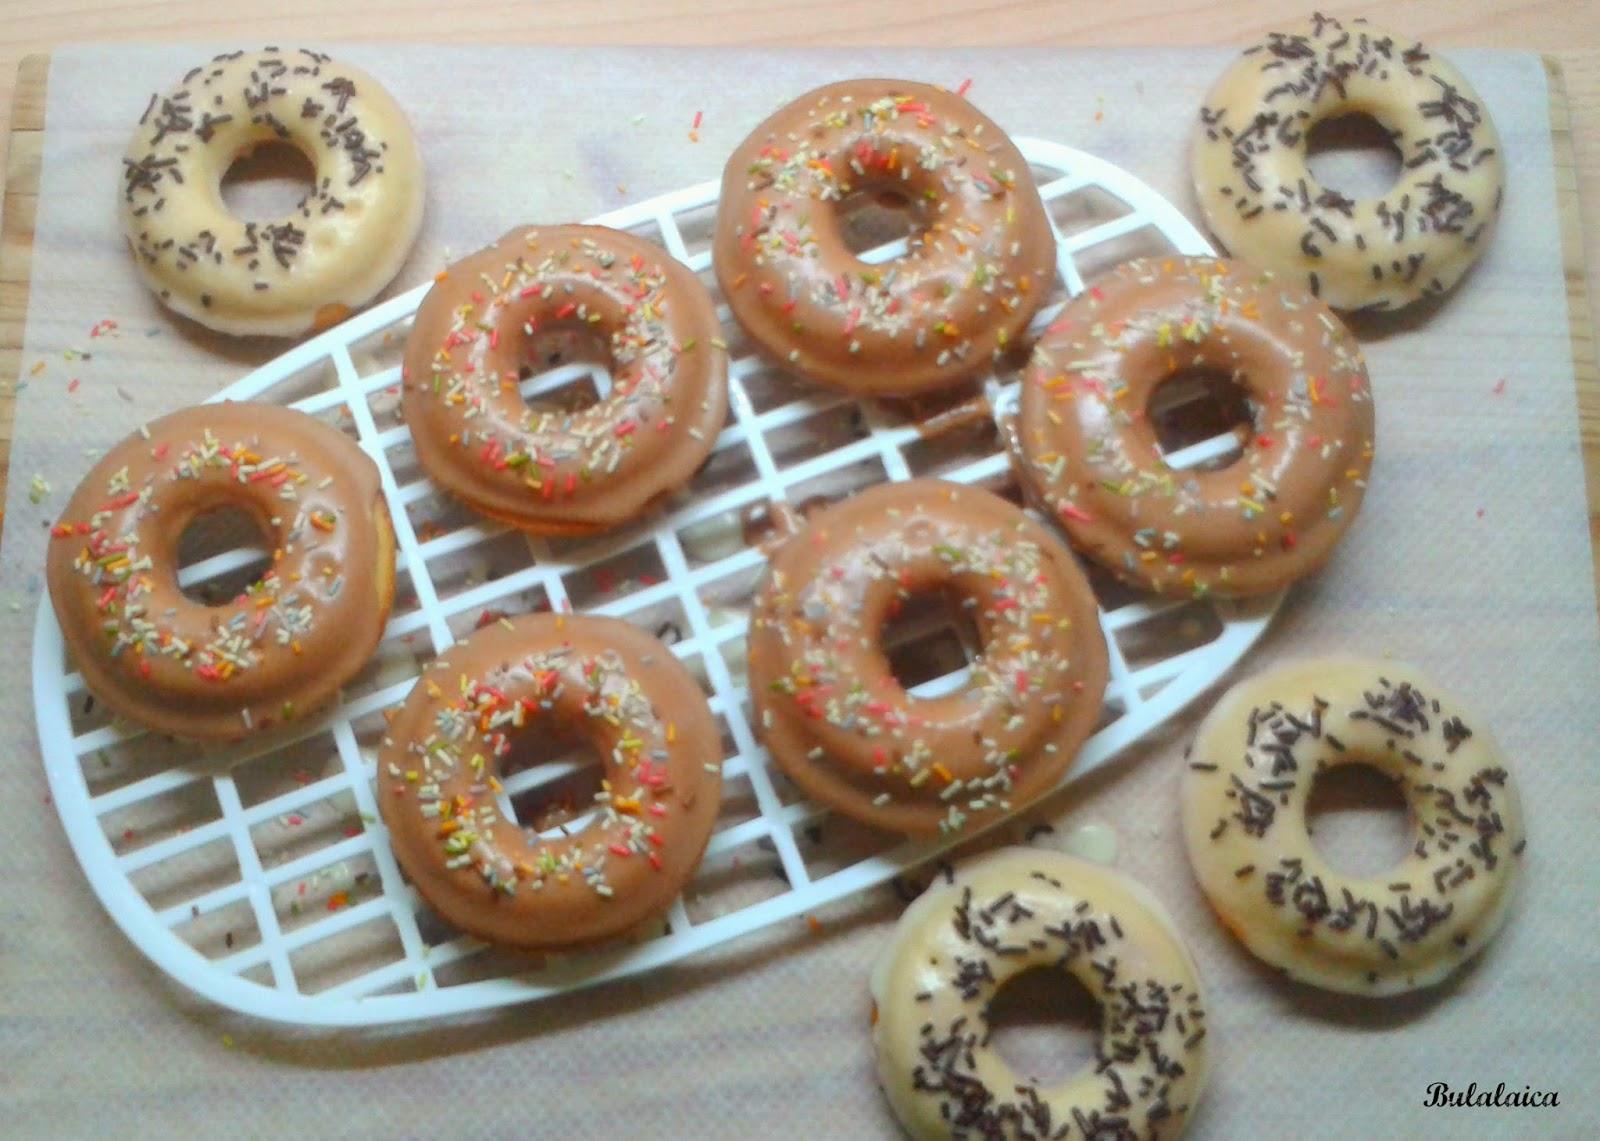 Donuts al horno Bulalaica